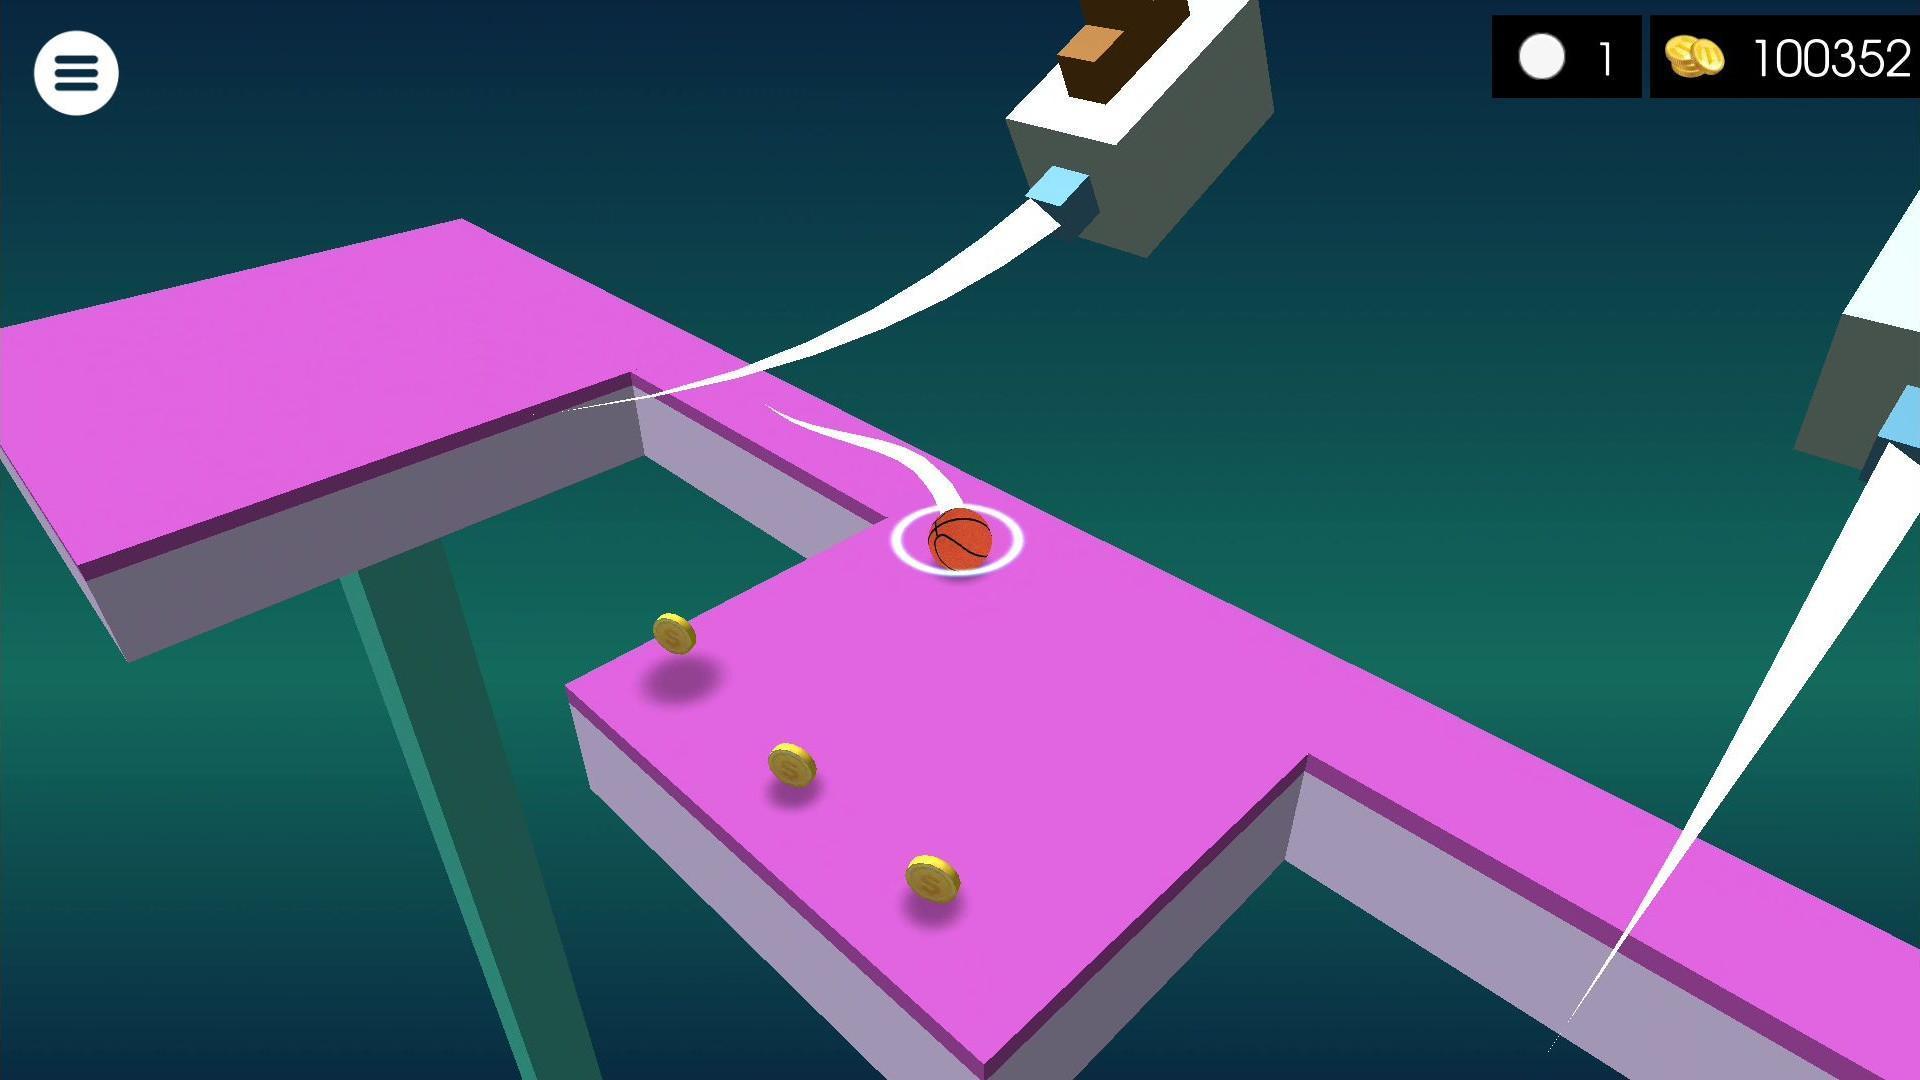 RYWO free 3D roll ball game 1.2.3 Screenshot 12